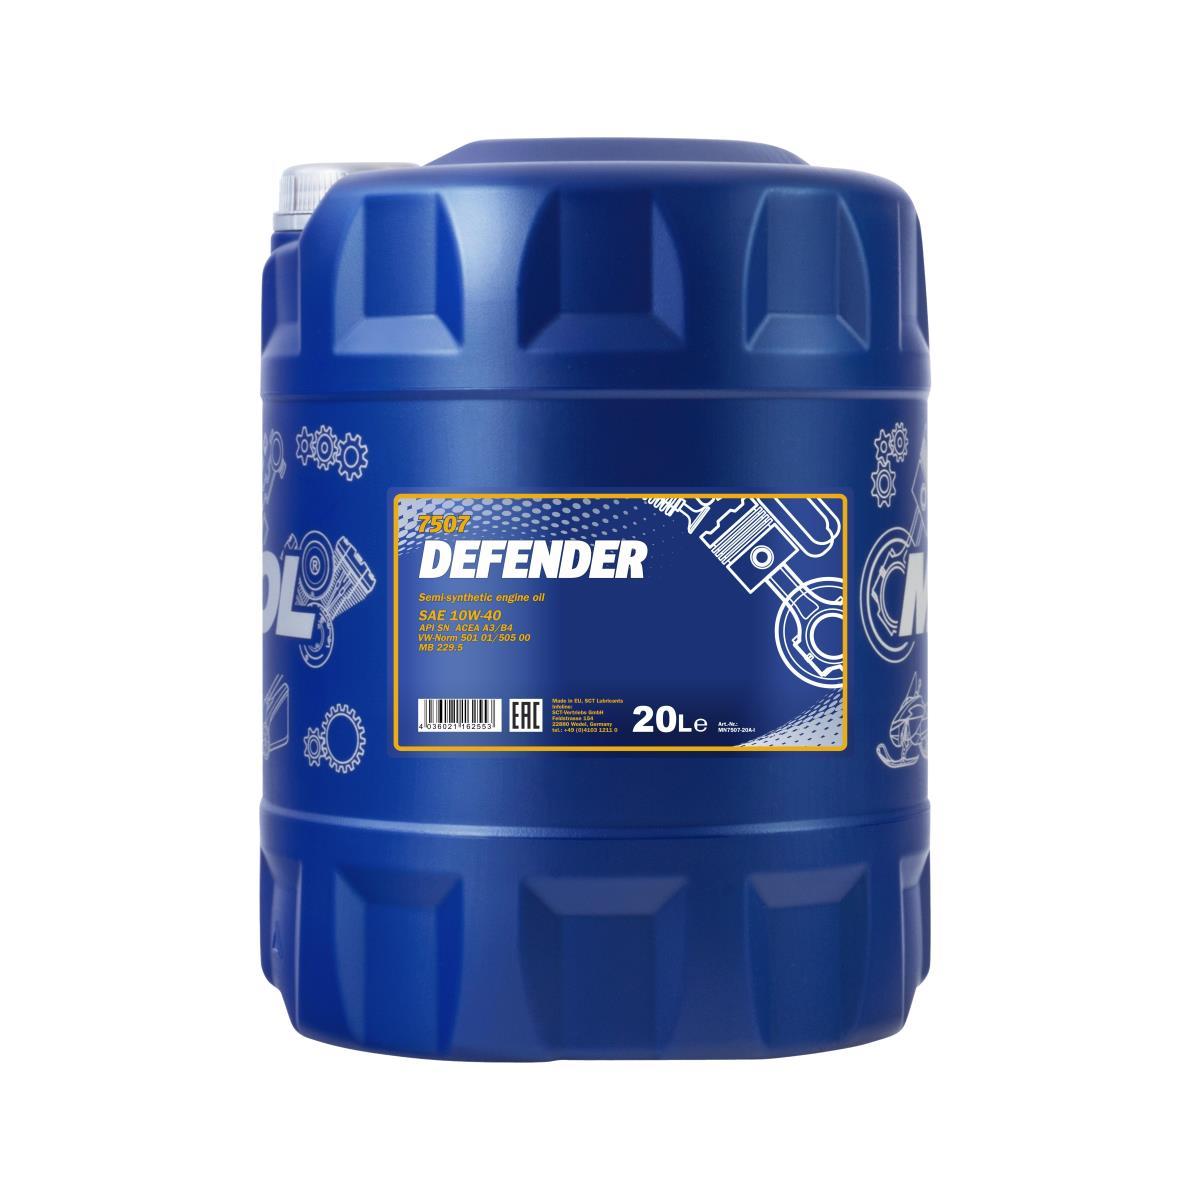 Aceite-del-motor-aceite-5w40-10w40-15w40-5w30-10w60-1l-4l-5l-7l-10l-20l miniatura 14